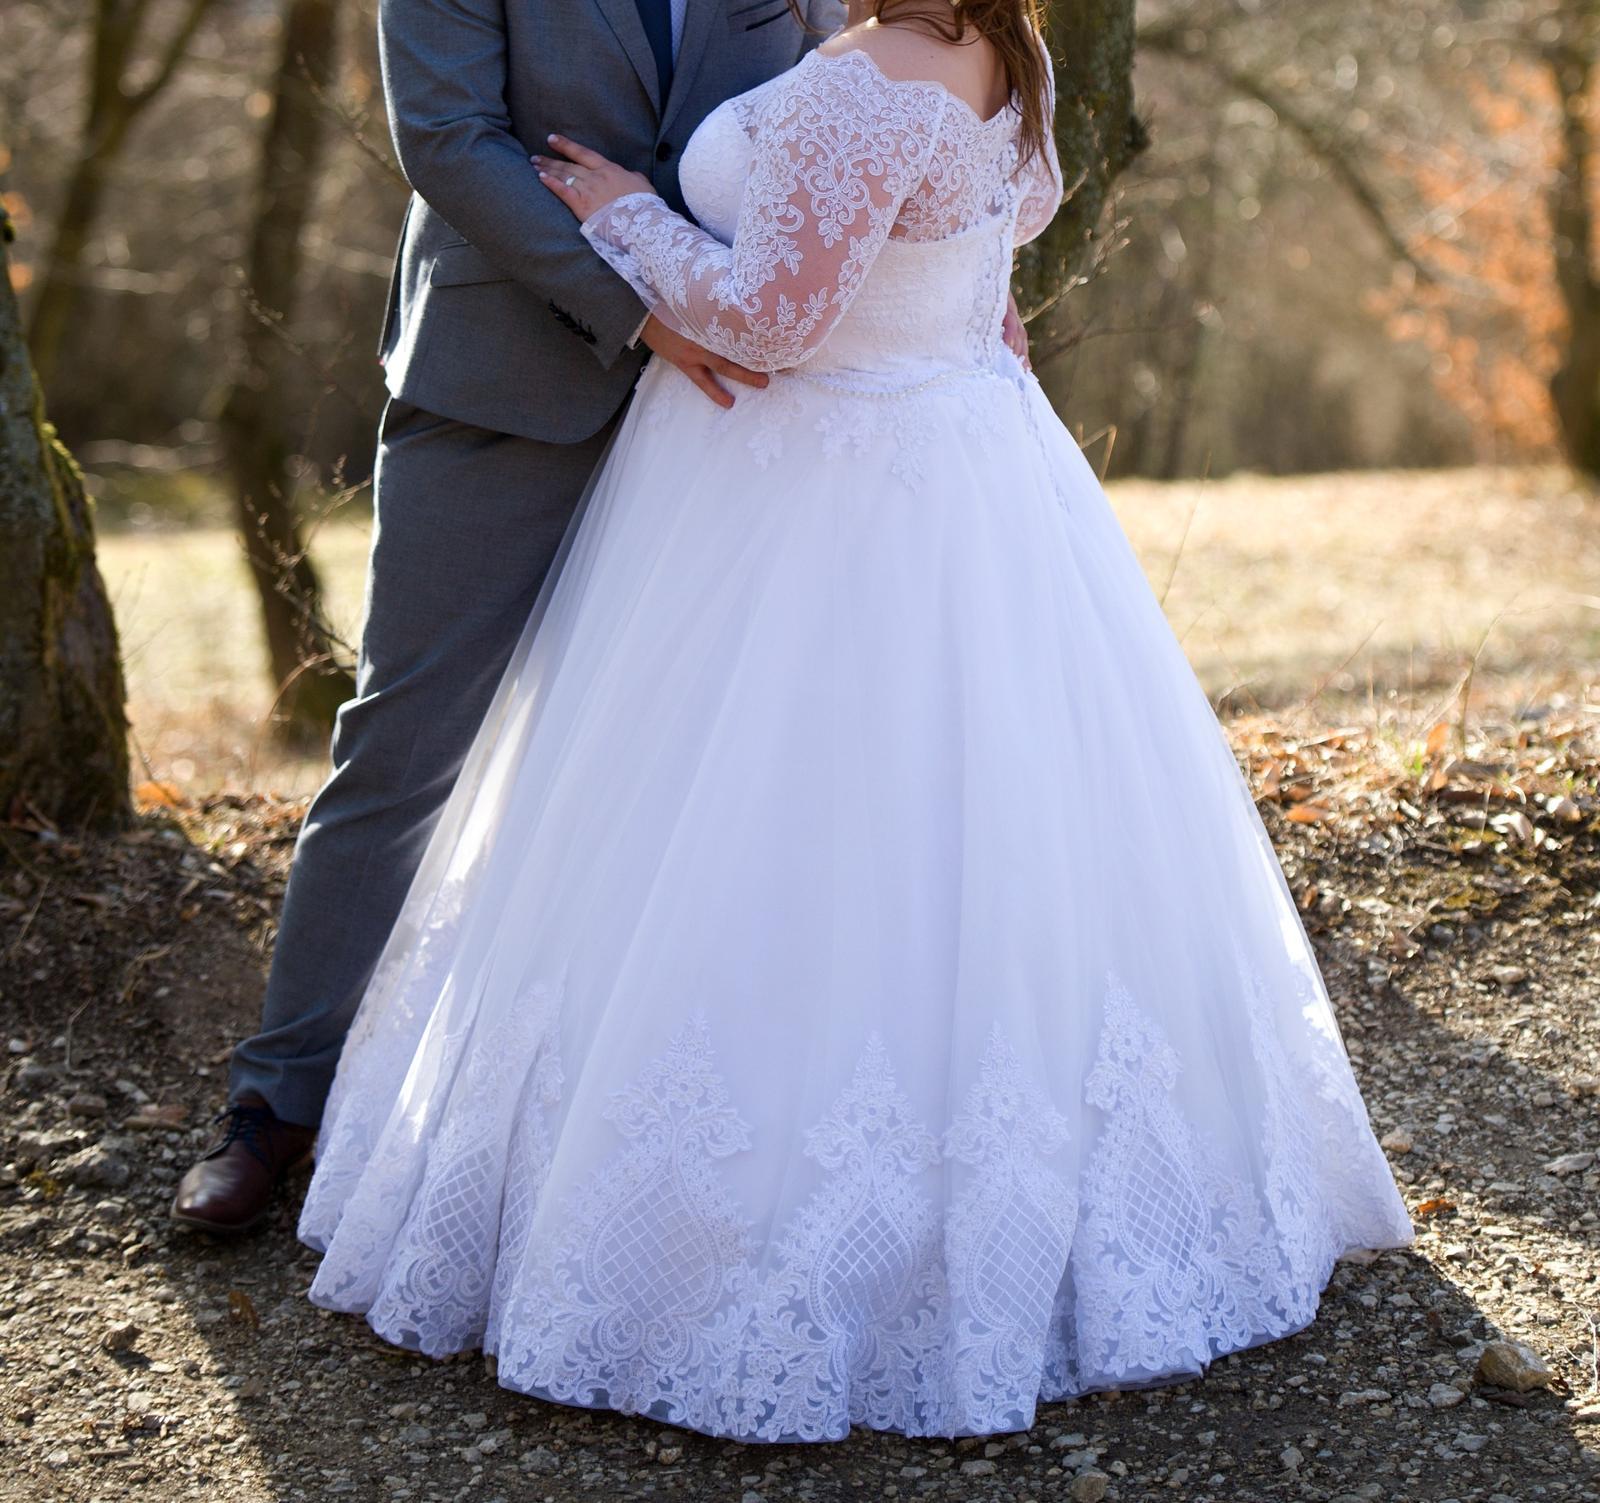 ee4afabed6c7 Snehobiele svadobné šaty